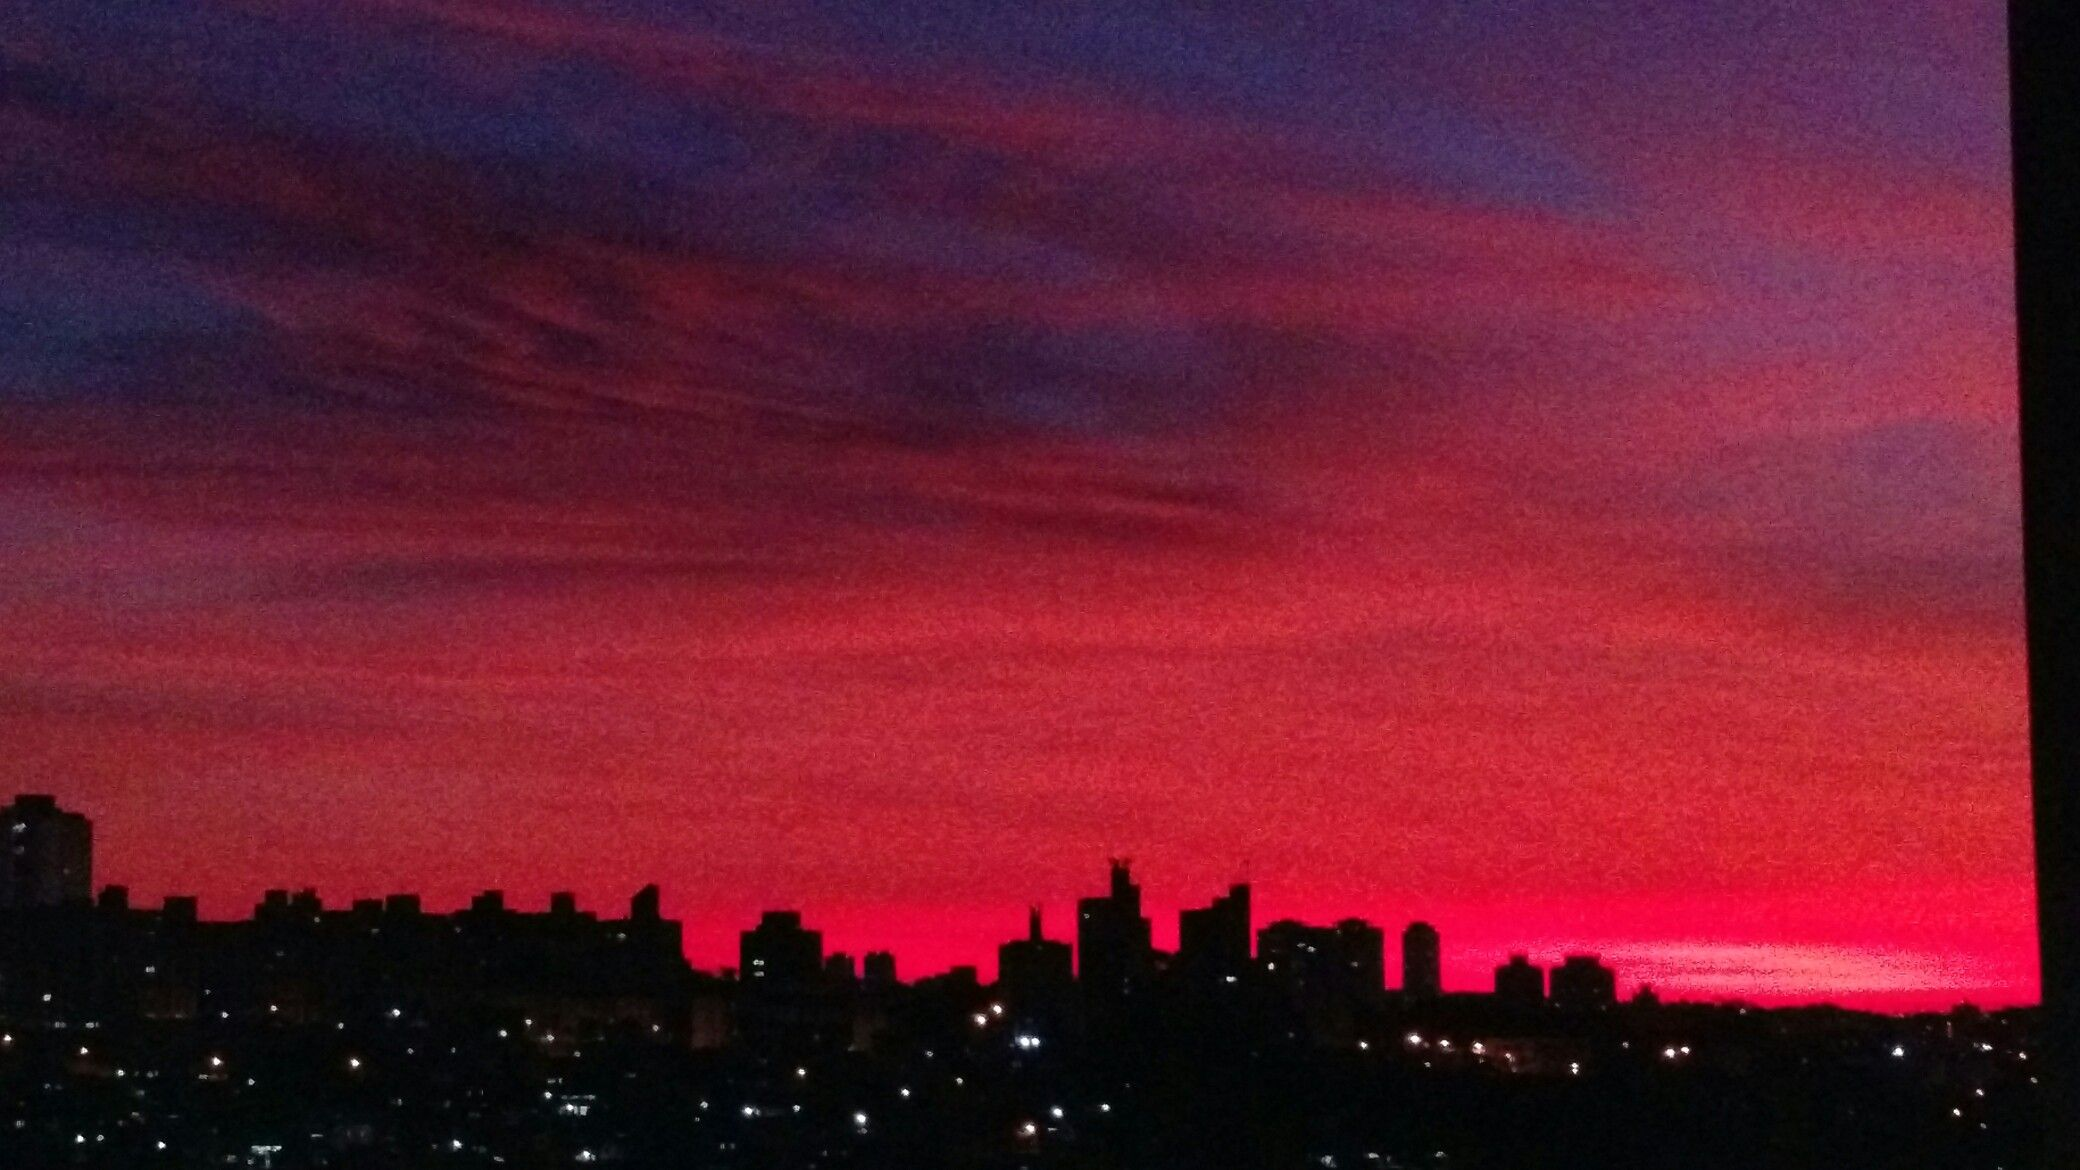 Pin by ANA MARIA on sunset Pinterest Sunset